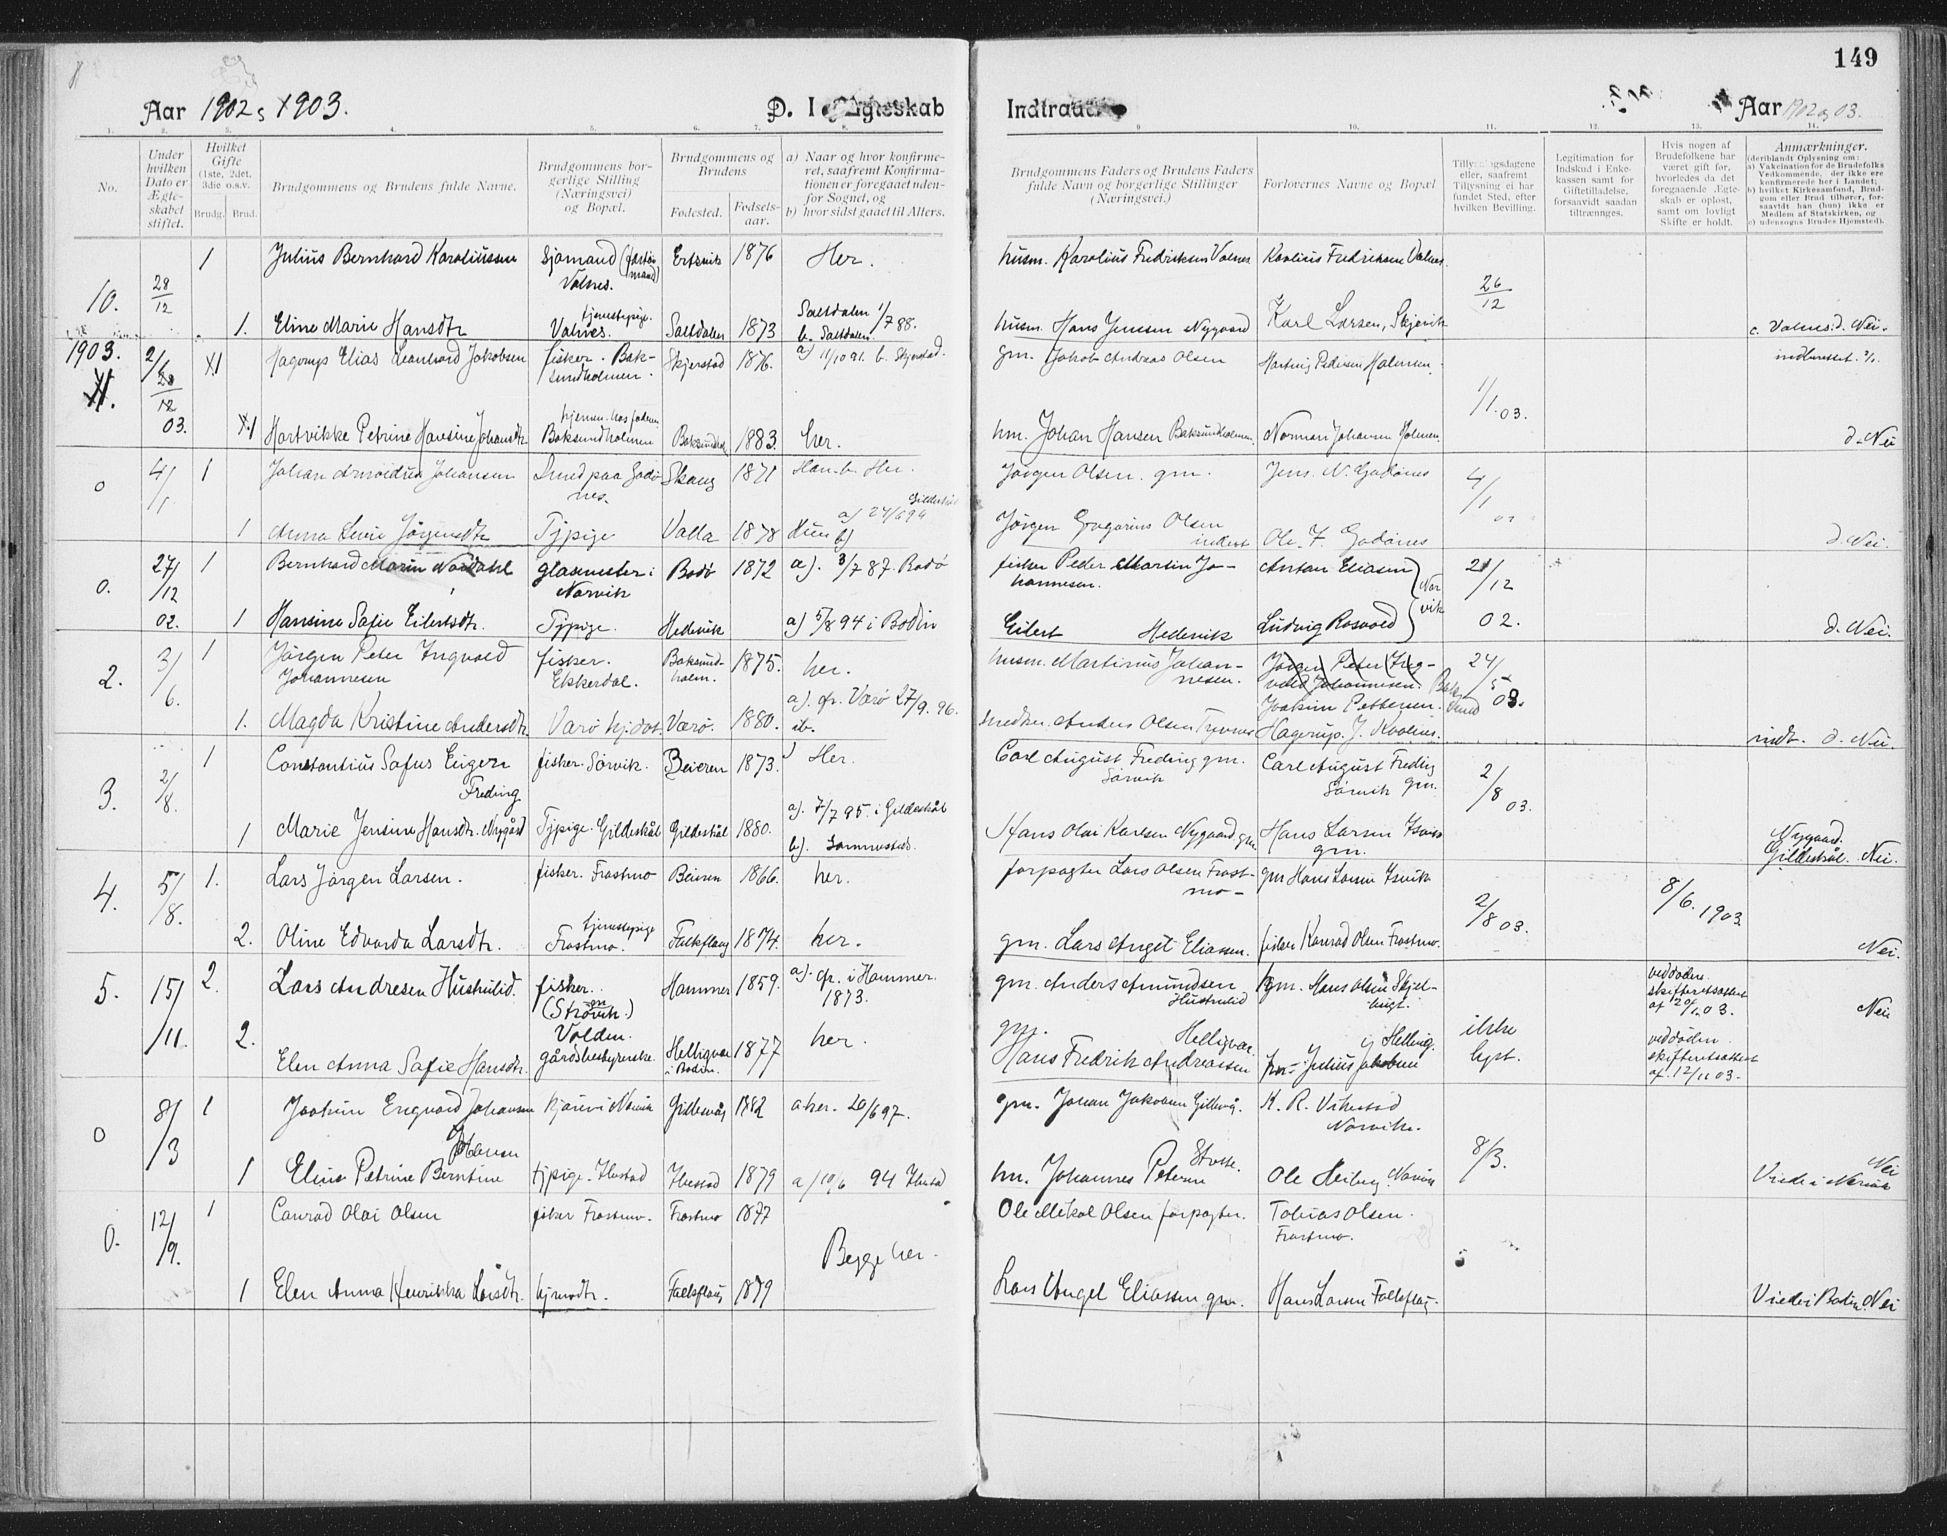 SAT, Ministerialprotokoller, klokkerbøker og fødselsregistre - Nordland, 804/L0081: Ministerialbok nr. 804A02, 1901-1915, s. 149